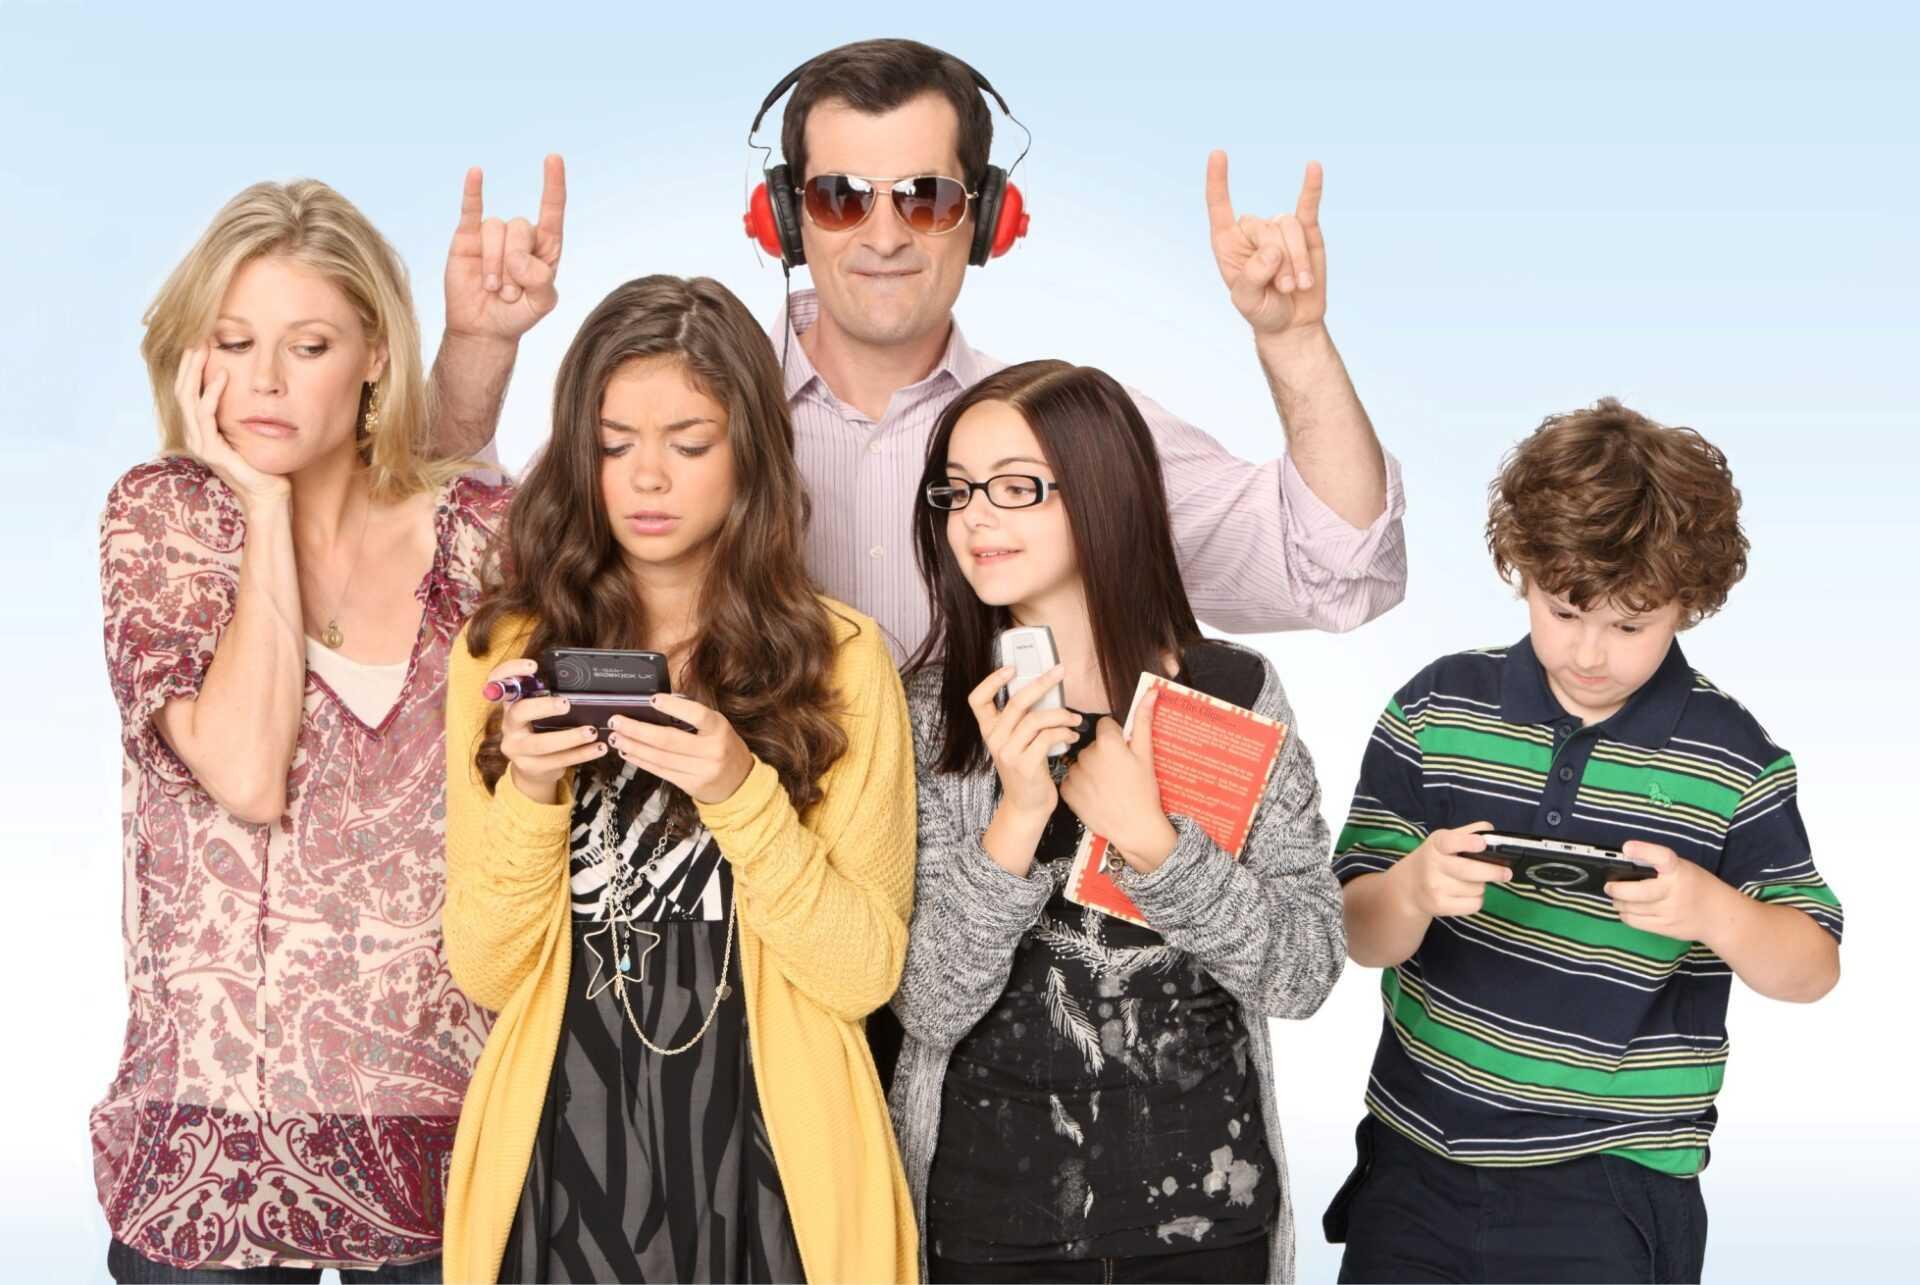 Modern Family sbanca gli Emmy Awards e arriva su MTV Italia   Digitale terrestre: Dtti.it